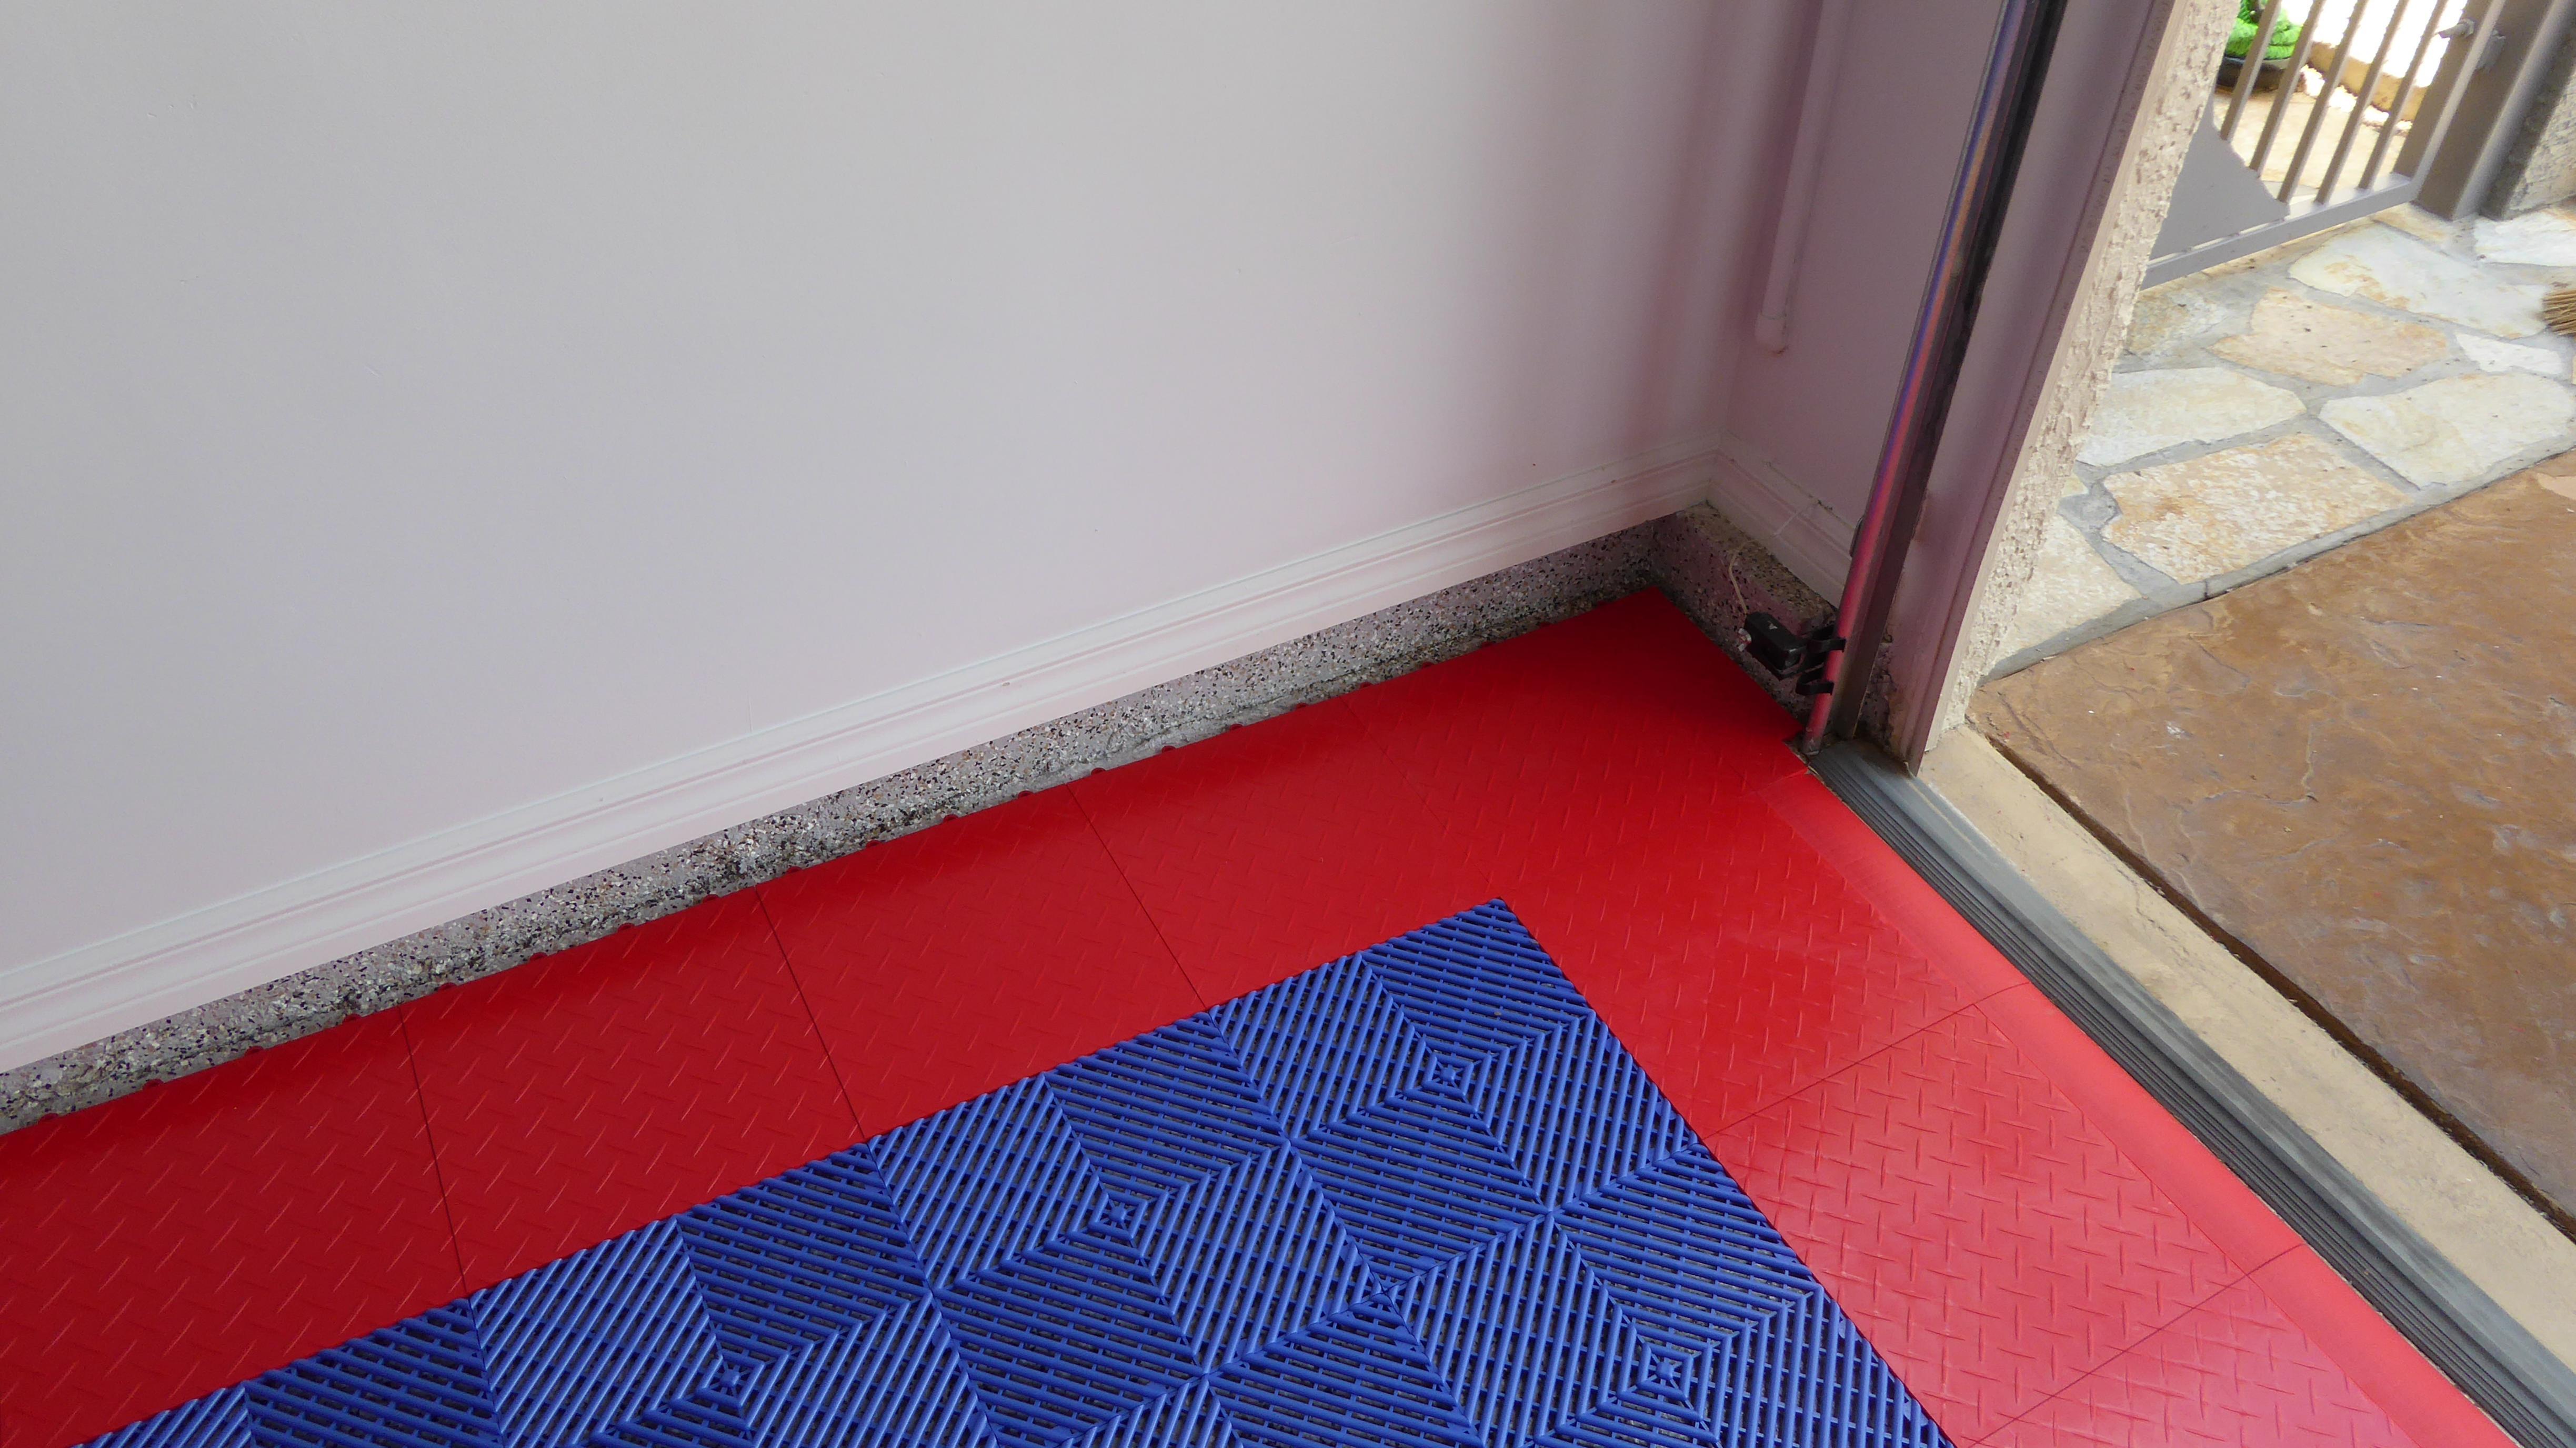 Installing racedeck garage flooring name p1050232g views 2524 size 103 dailygadgetfo Gallery